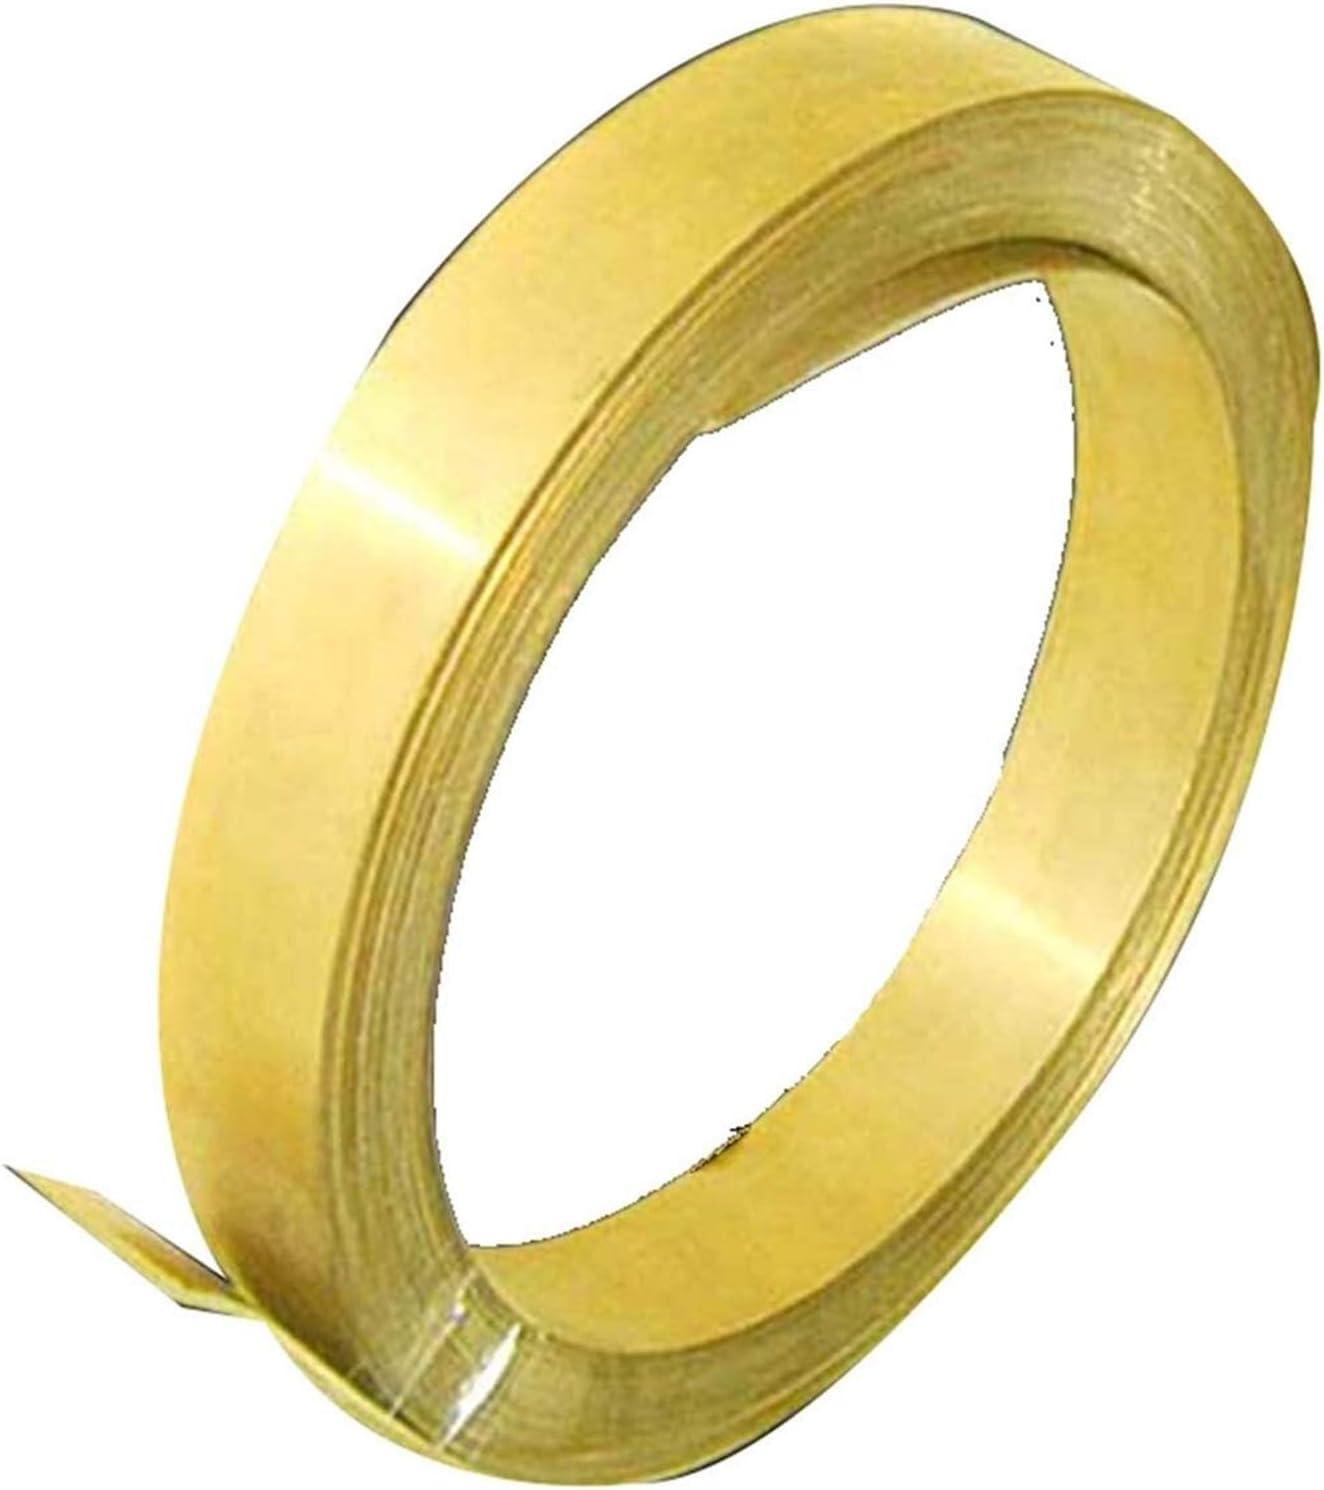 Wzqwzj Brass Metal quality assurance Thin Sheet Foil Size Plate Long-awaited Pure Copper